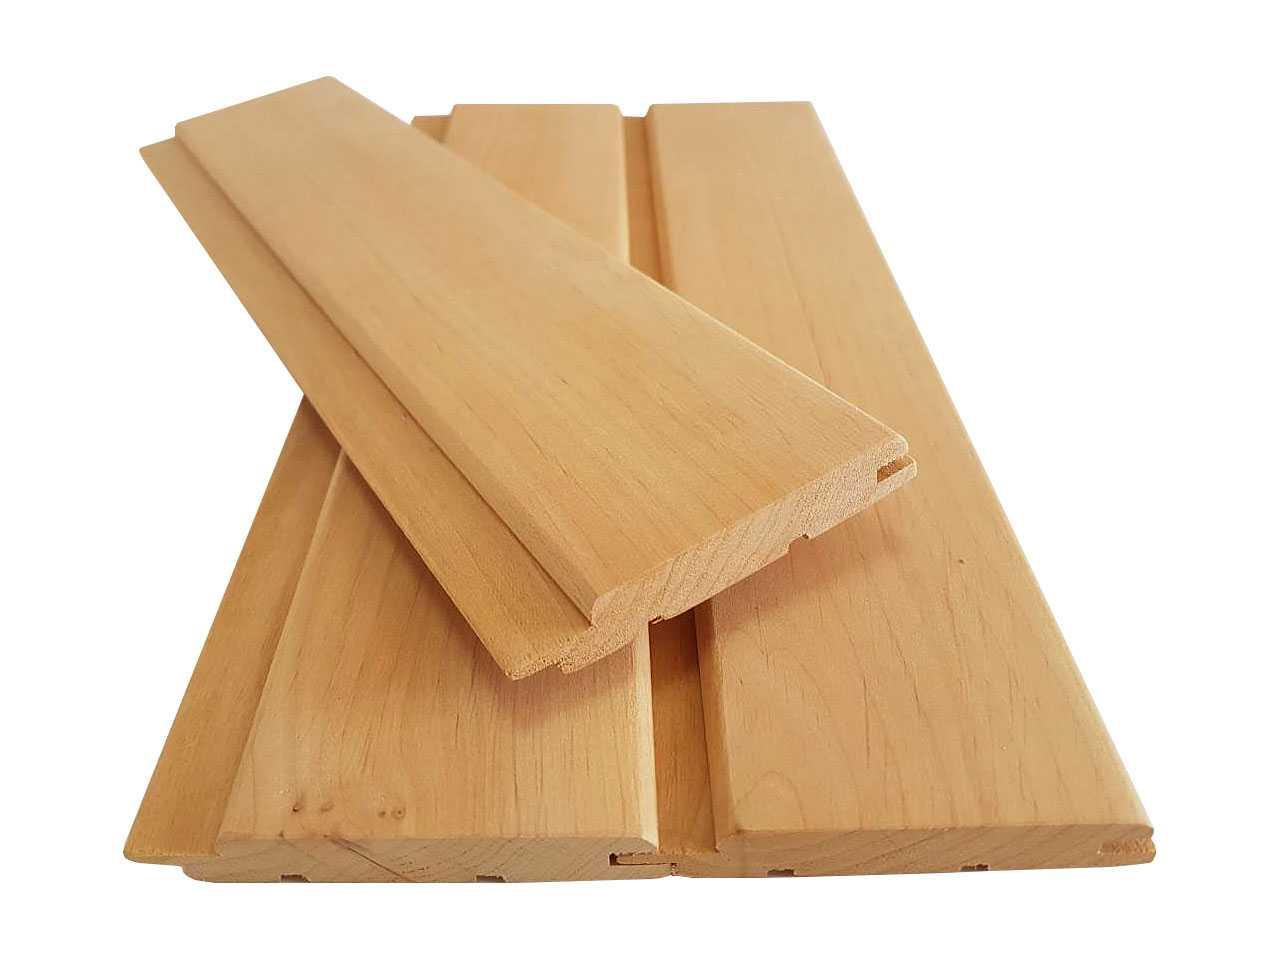 Вагонка ольха для обшивки стен в комнатах отдыха 80x15 в/с 0,9-1,9 мм.